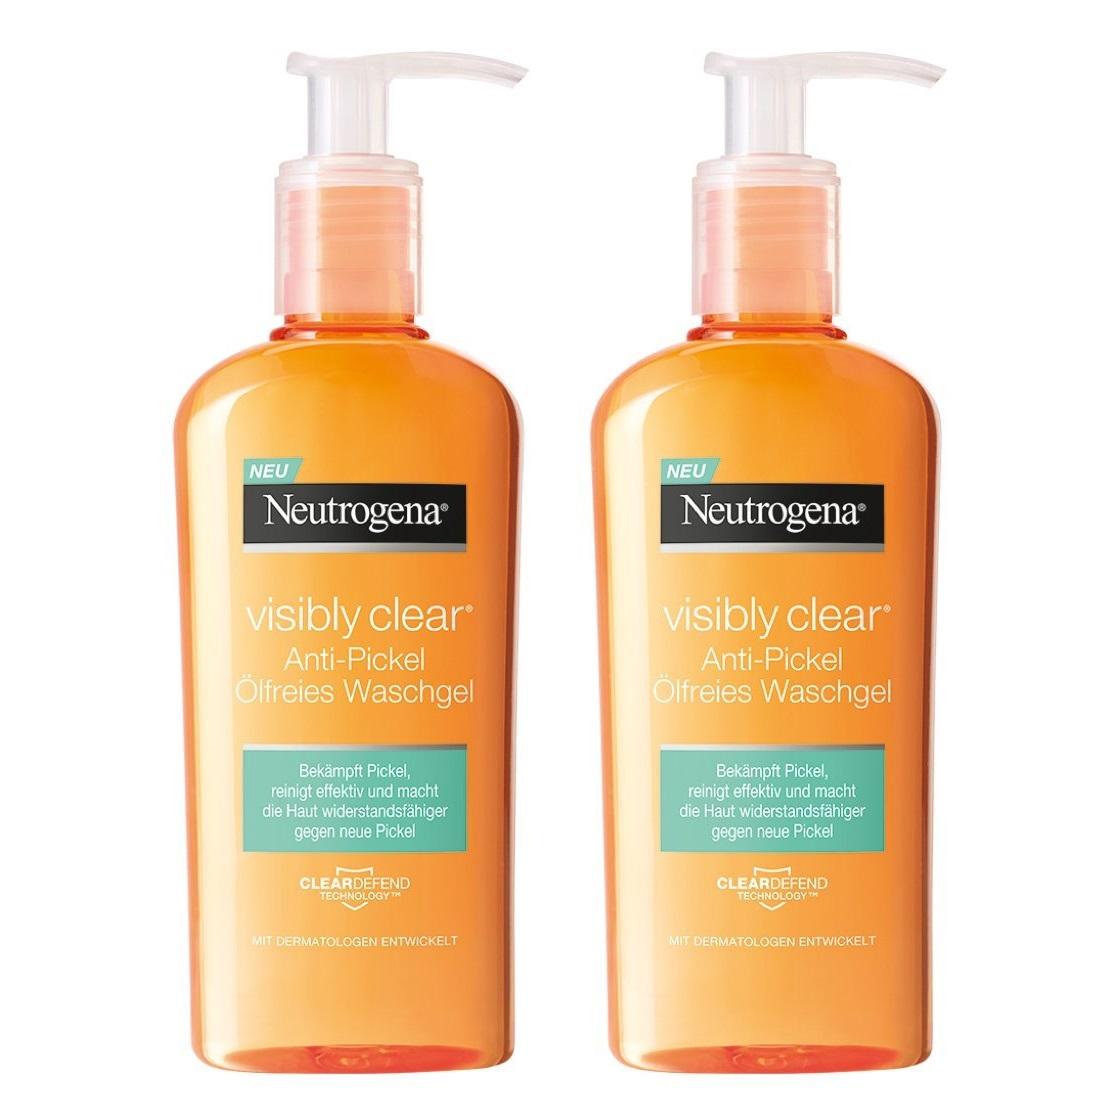 Neutrogena 露得清 控油保湿水杨酸洁面乳 200ml*2瓶